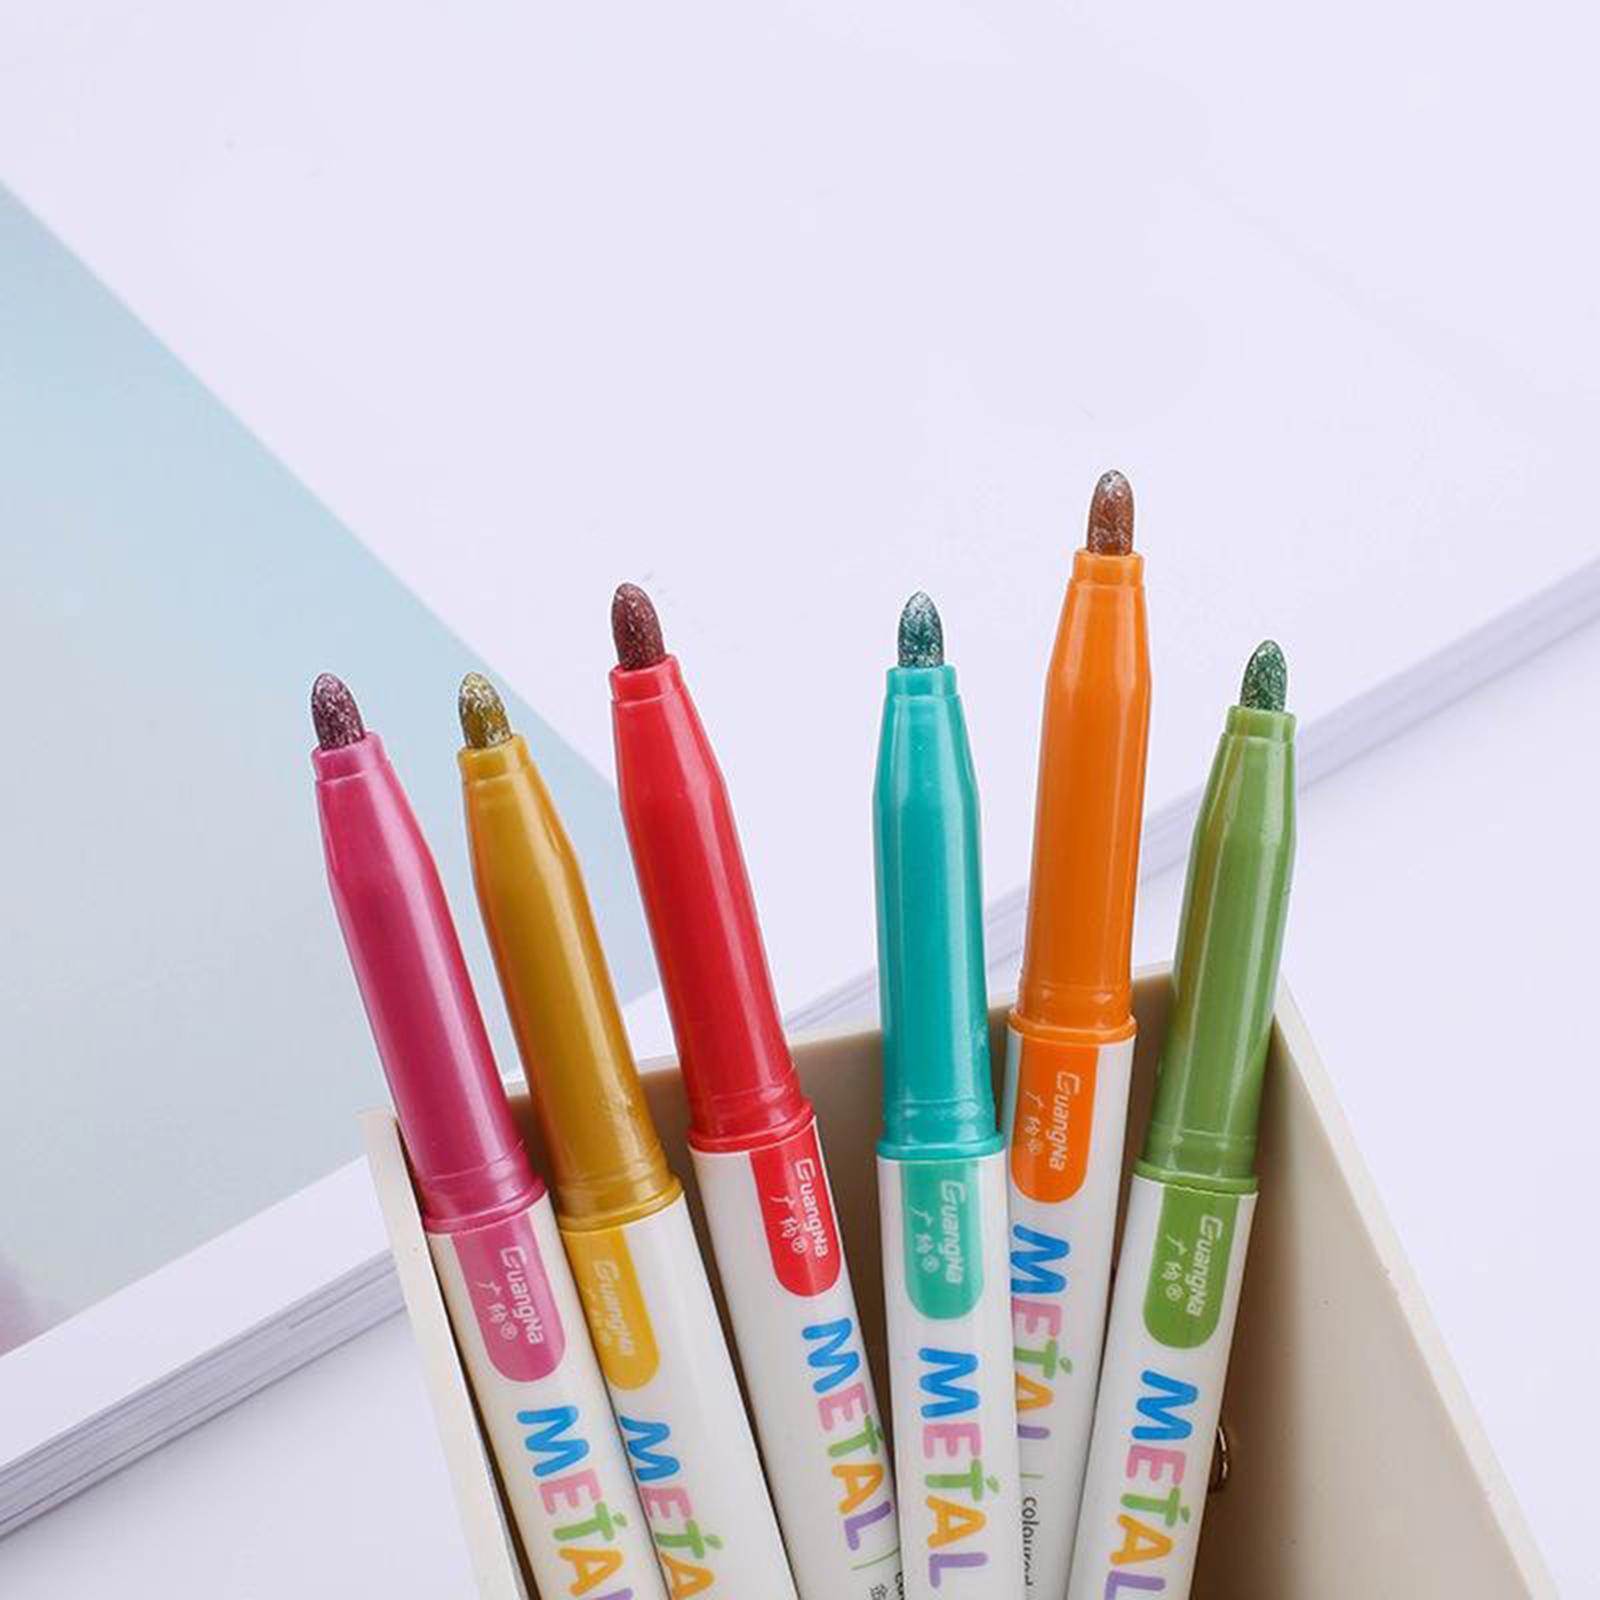 miniatura 15 - 8-12-20x-Permanente-Metallic-Marcatori-Vernici-Penne-per-Adulti-Colouring